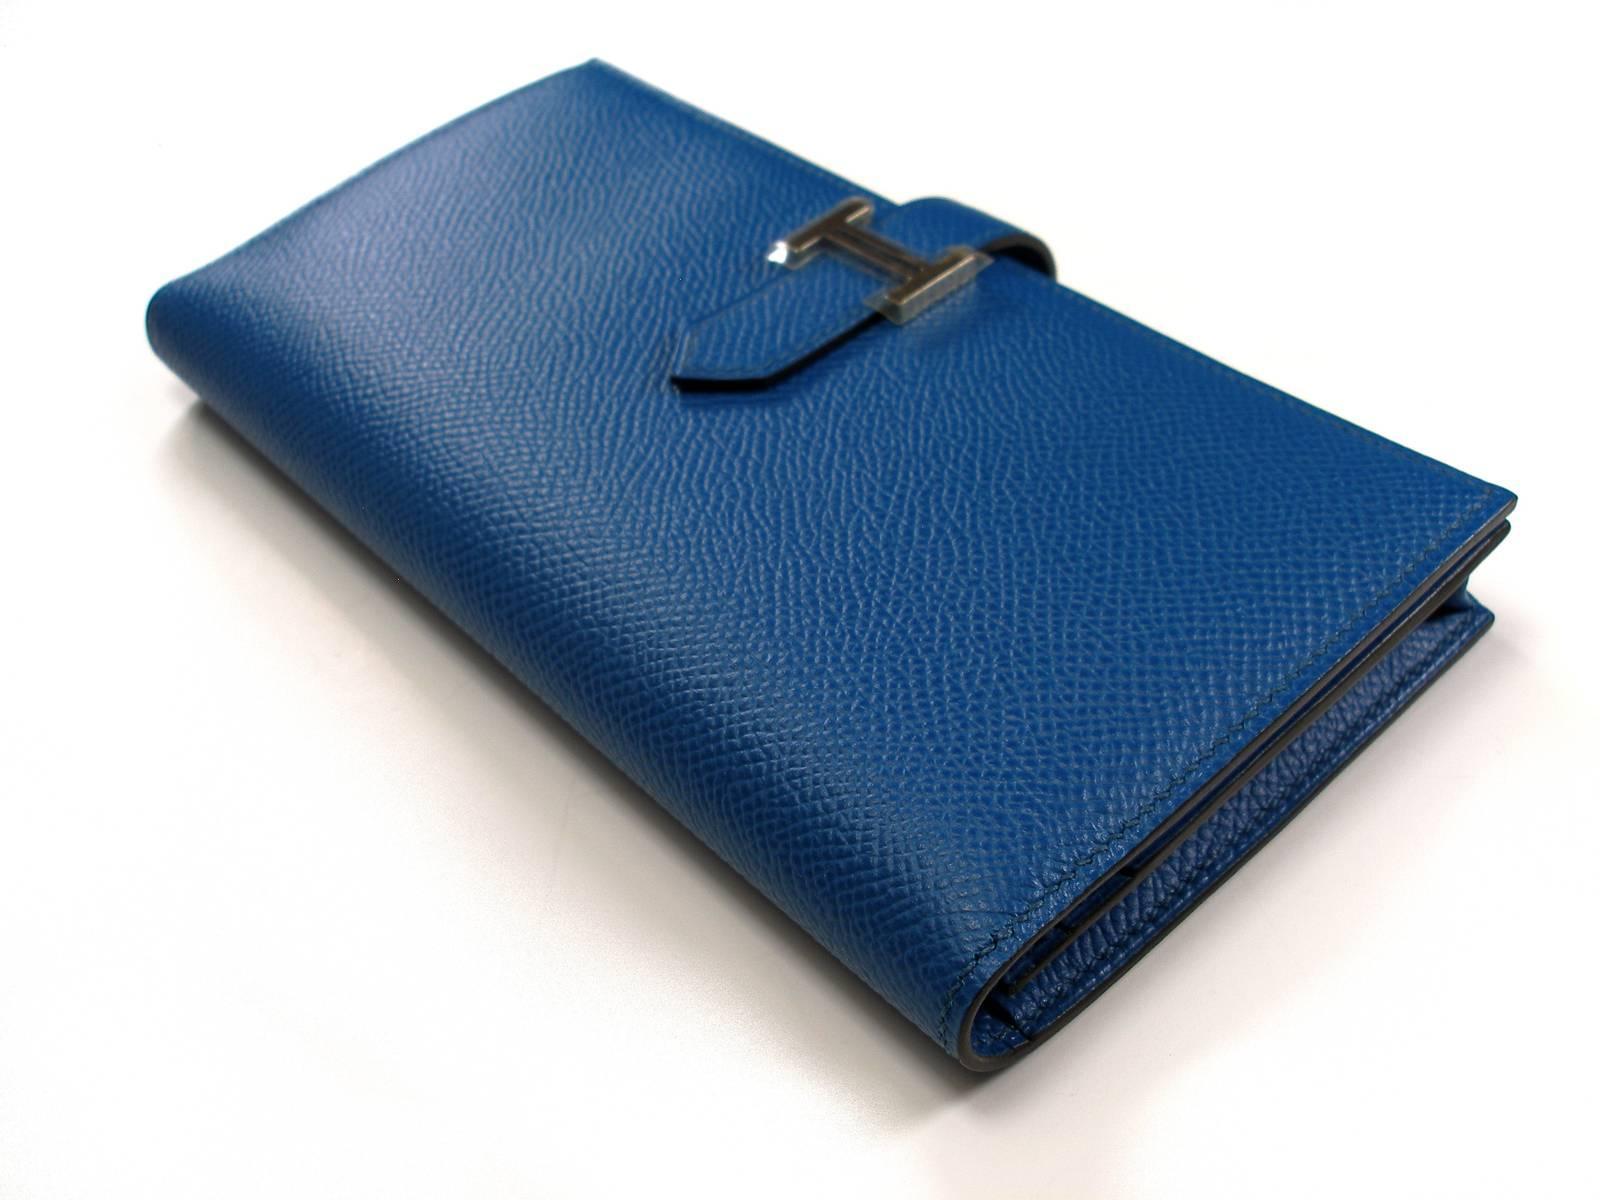 9e0c5a25d8 ... hermes red rouge h gold hardware ce94d 8aca9  where can i buy blue  hermès bleu electrique epsom leather h palladium bearn wallet for sale